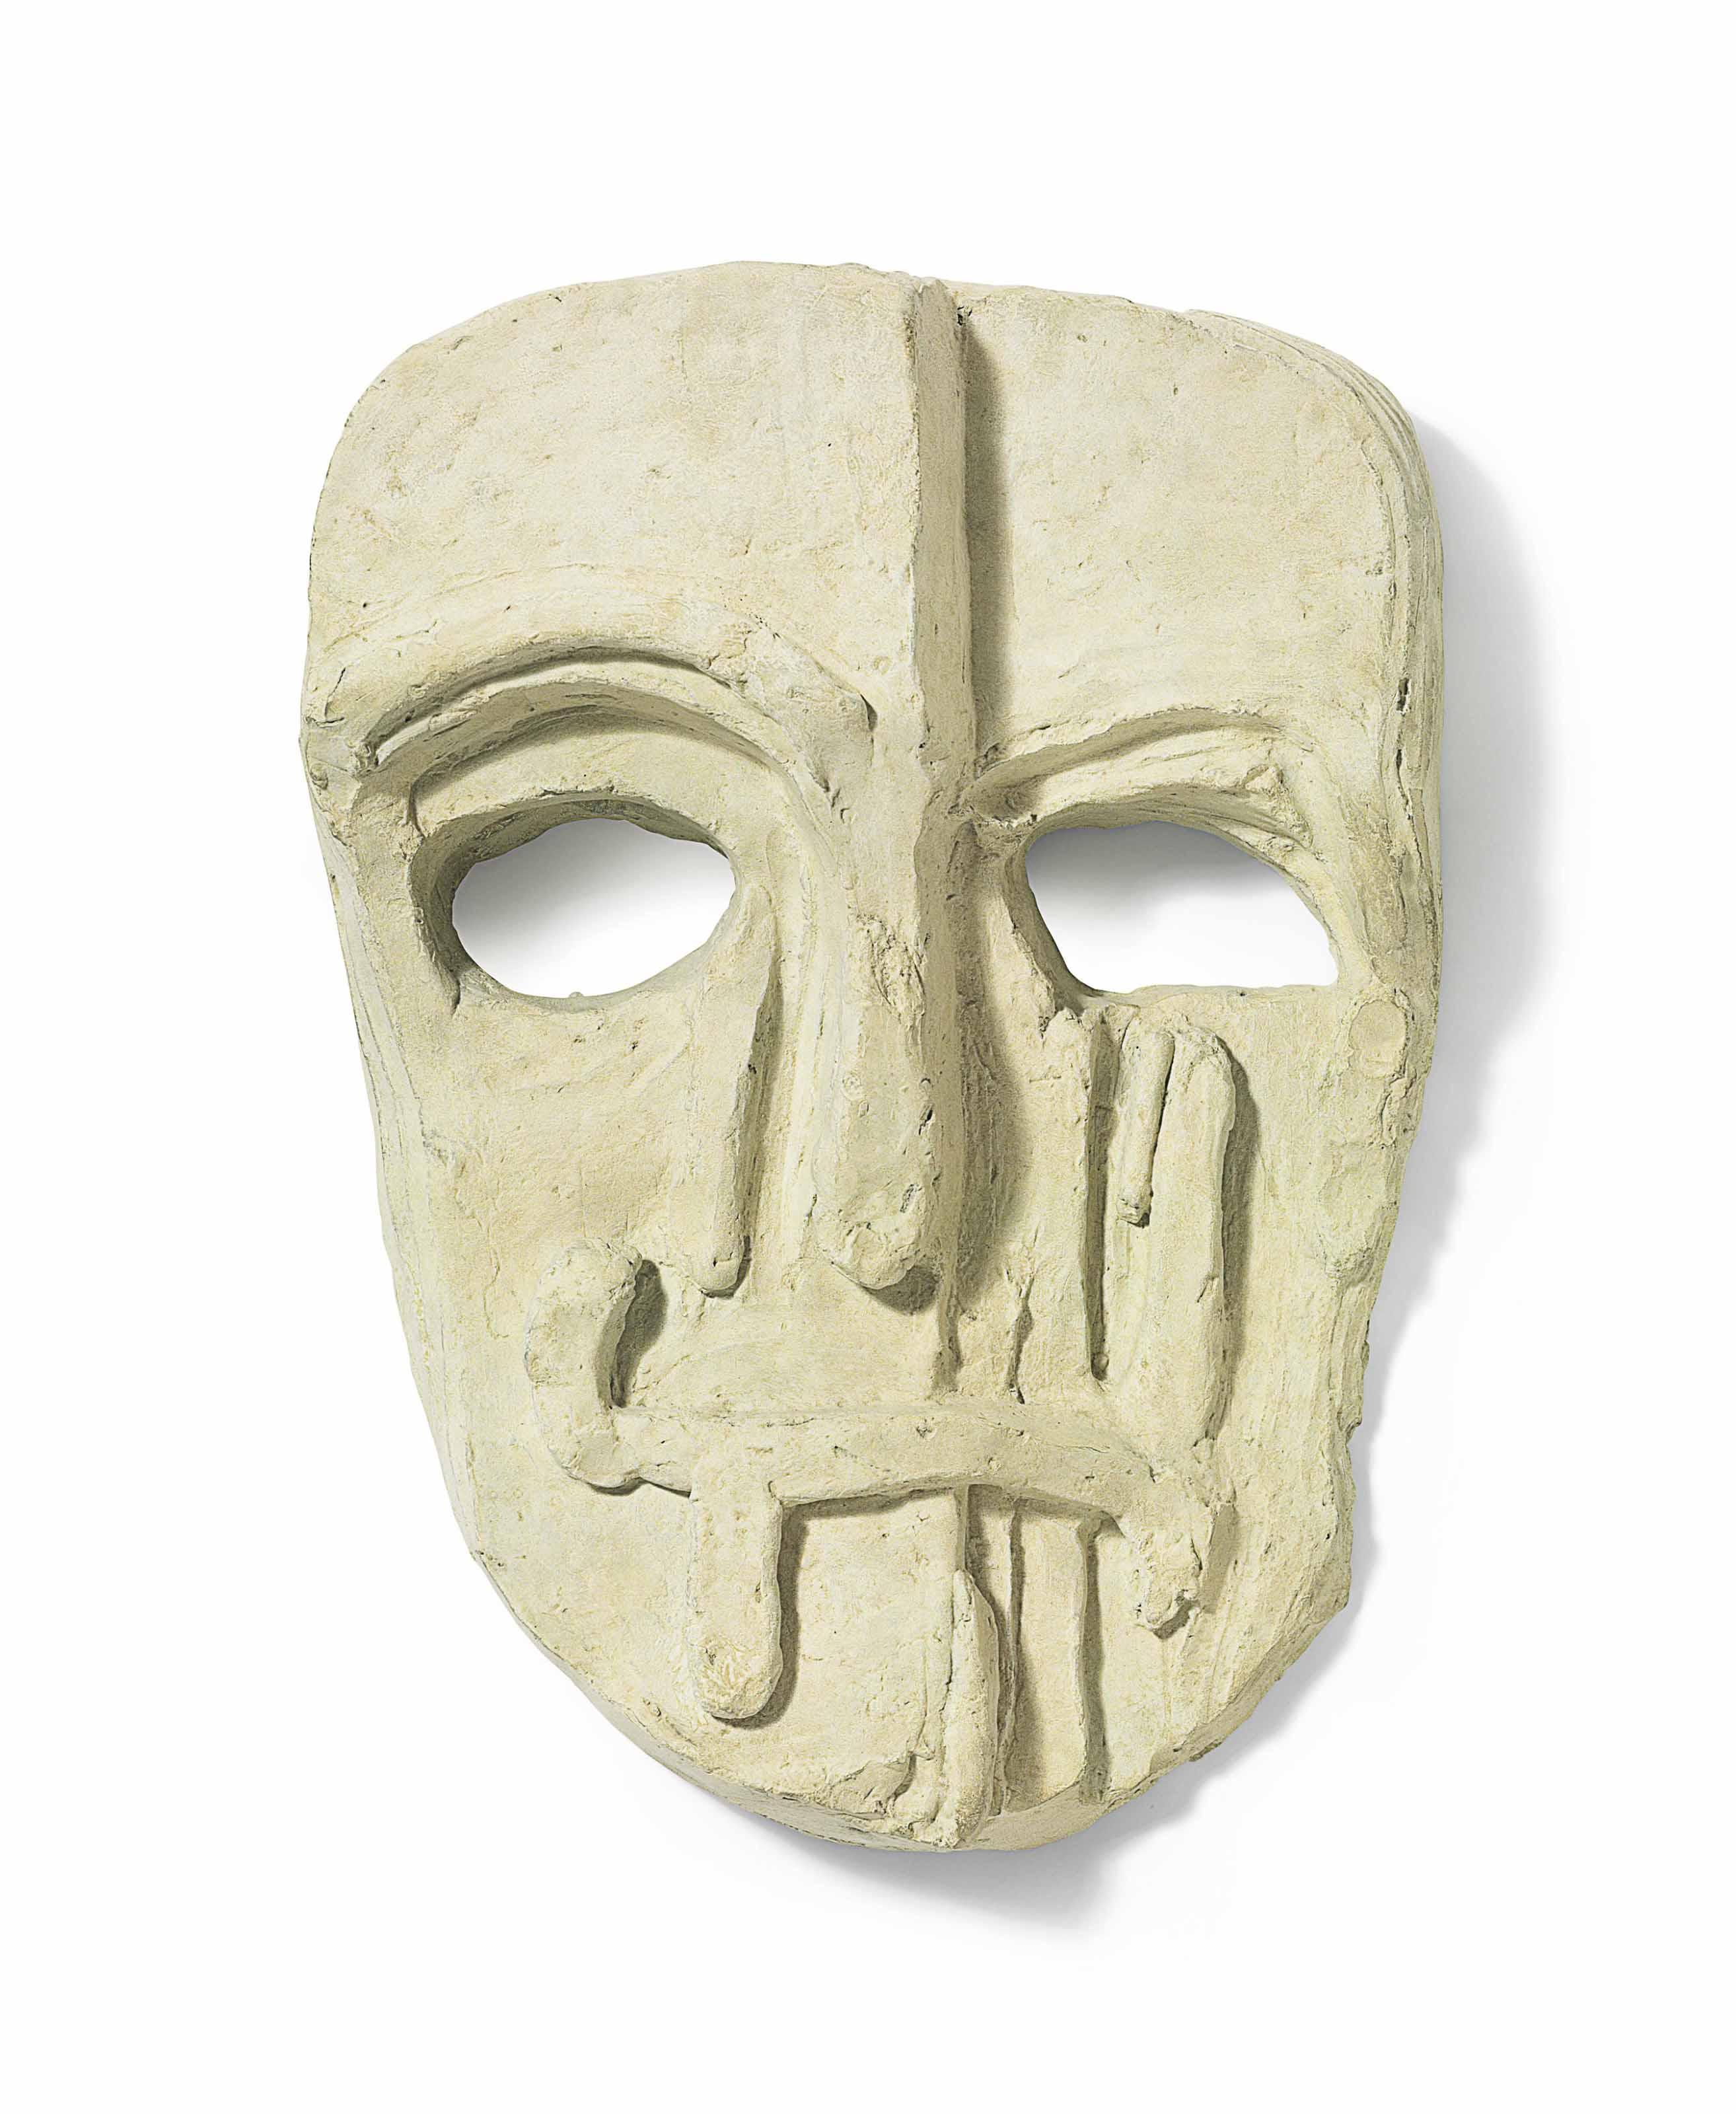 Untitled Mark (Viper Mask)